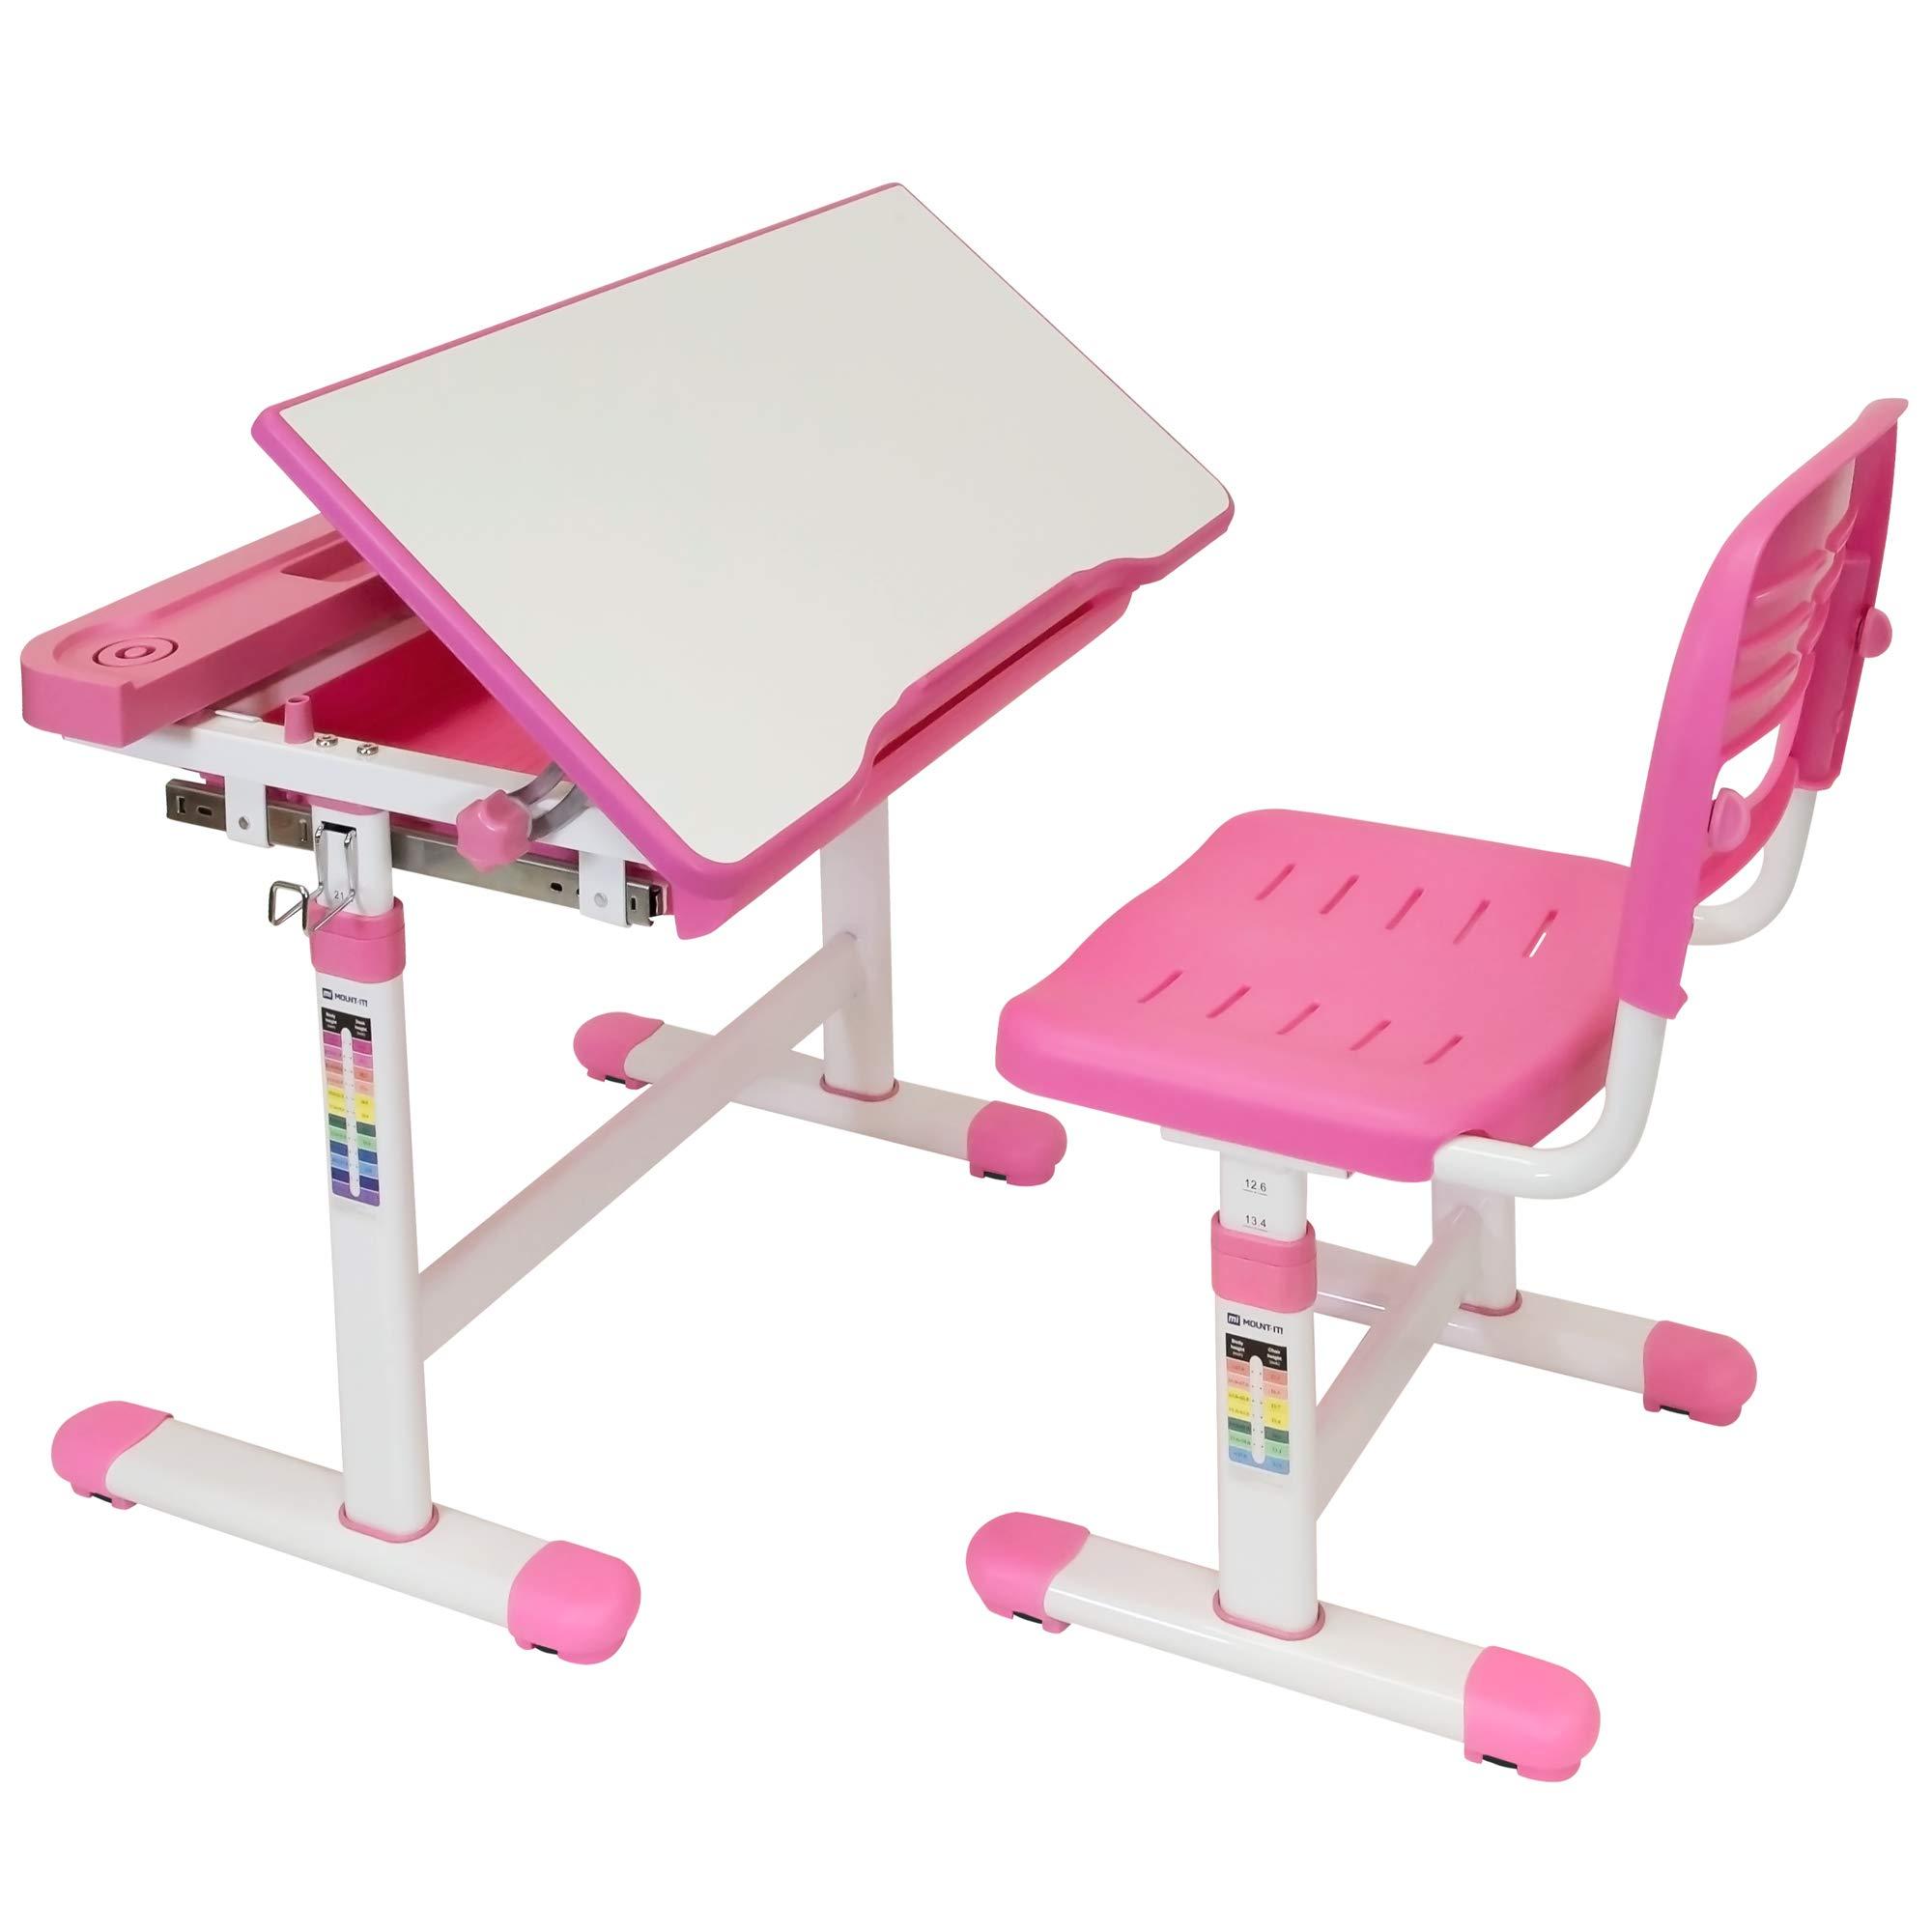 Mount-It! Kids Desk and Chair Set, Height Adjustable Ergonomic Children's School Workstation with Storage Drawer, Pink by Mount-It!